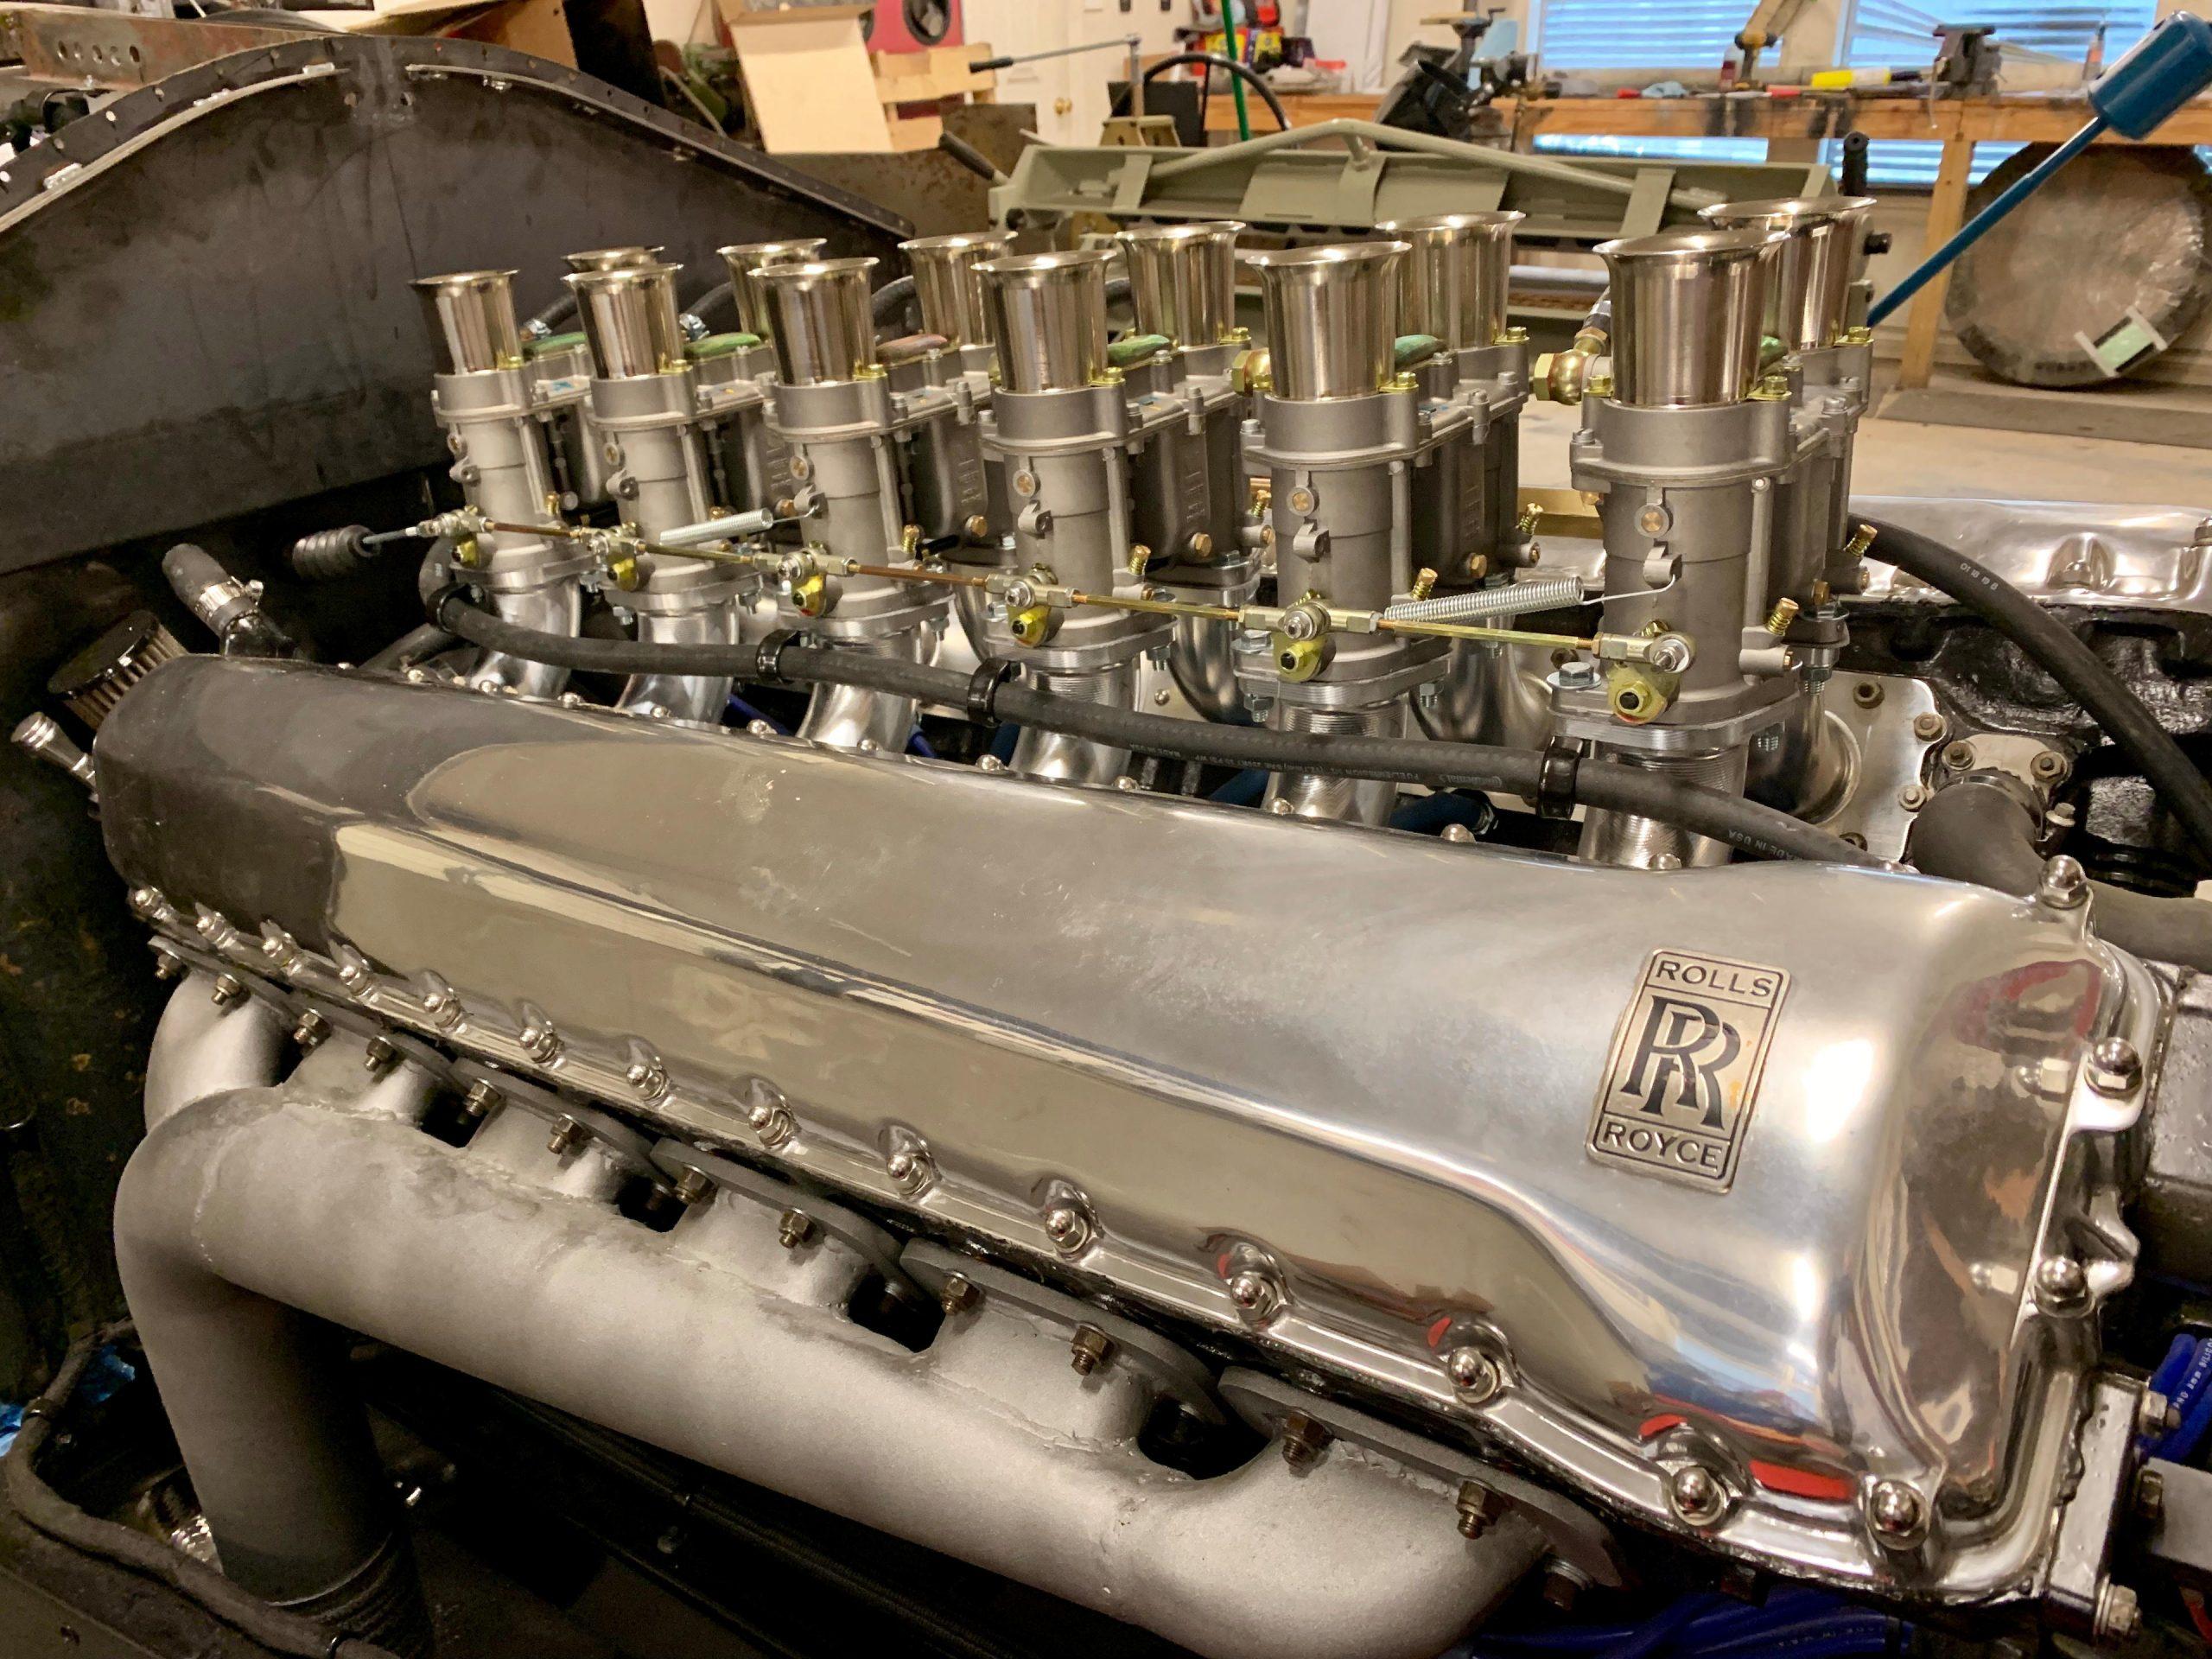 EX Series Phantom Recreation engine